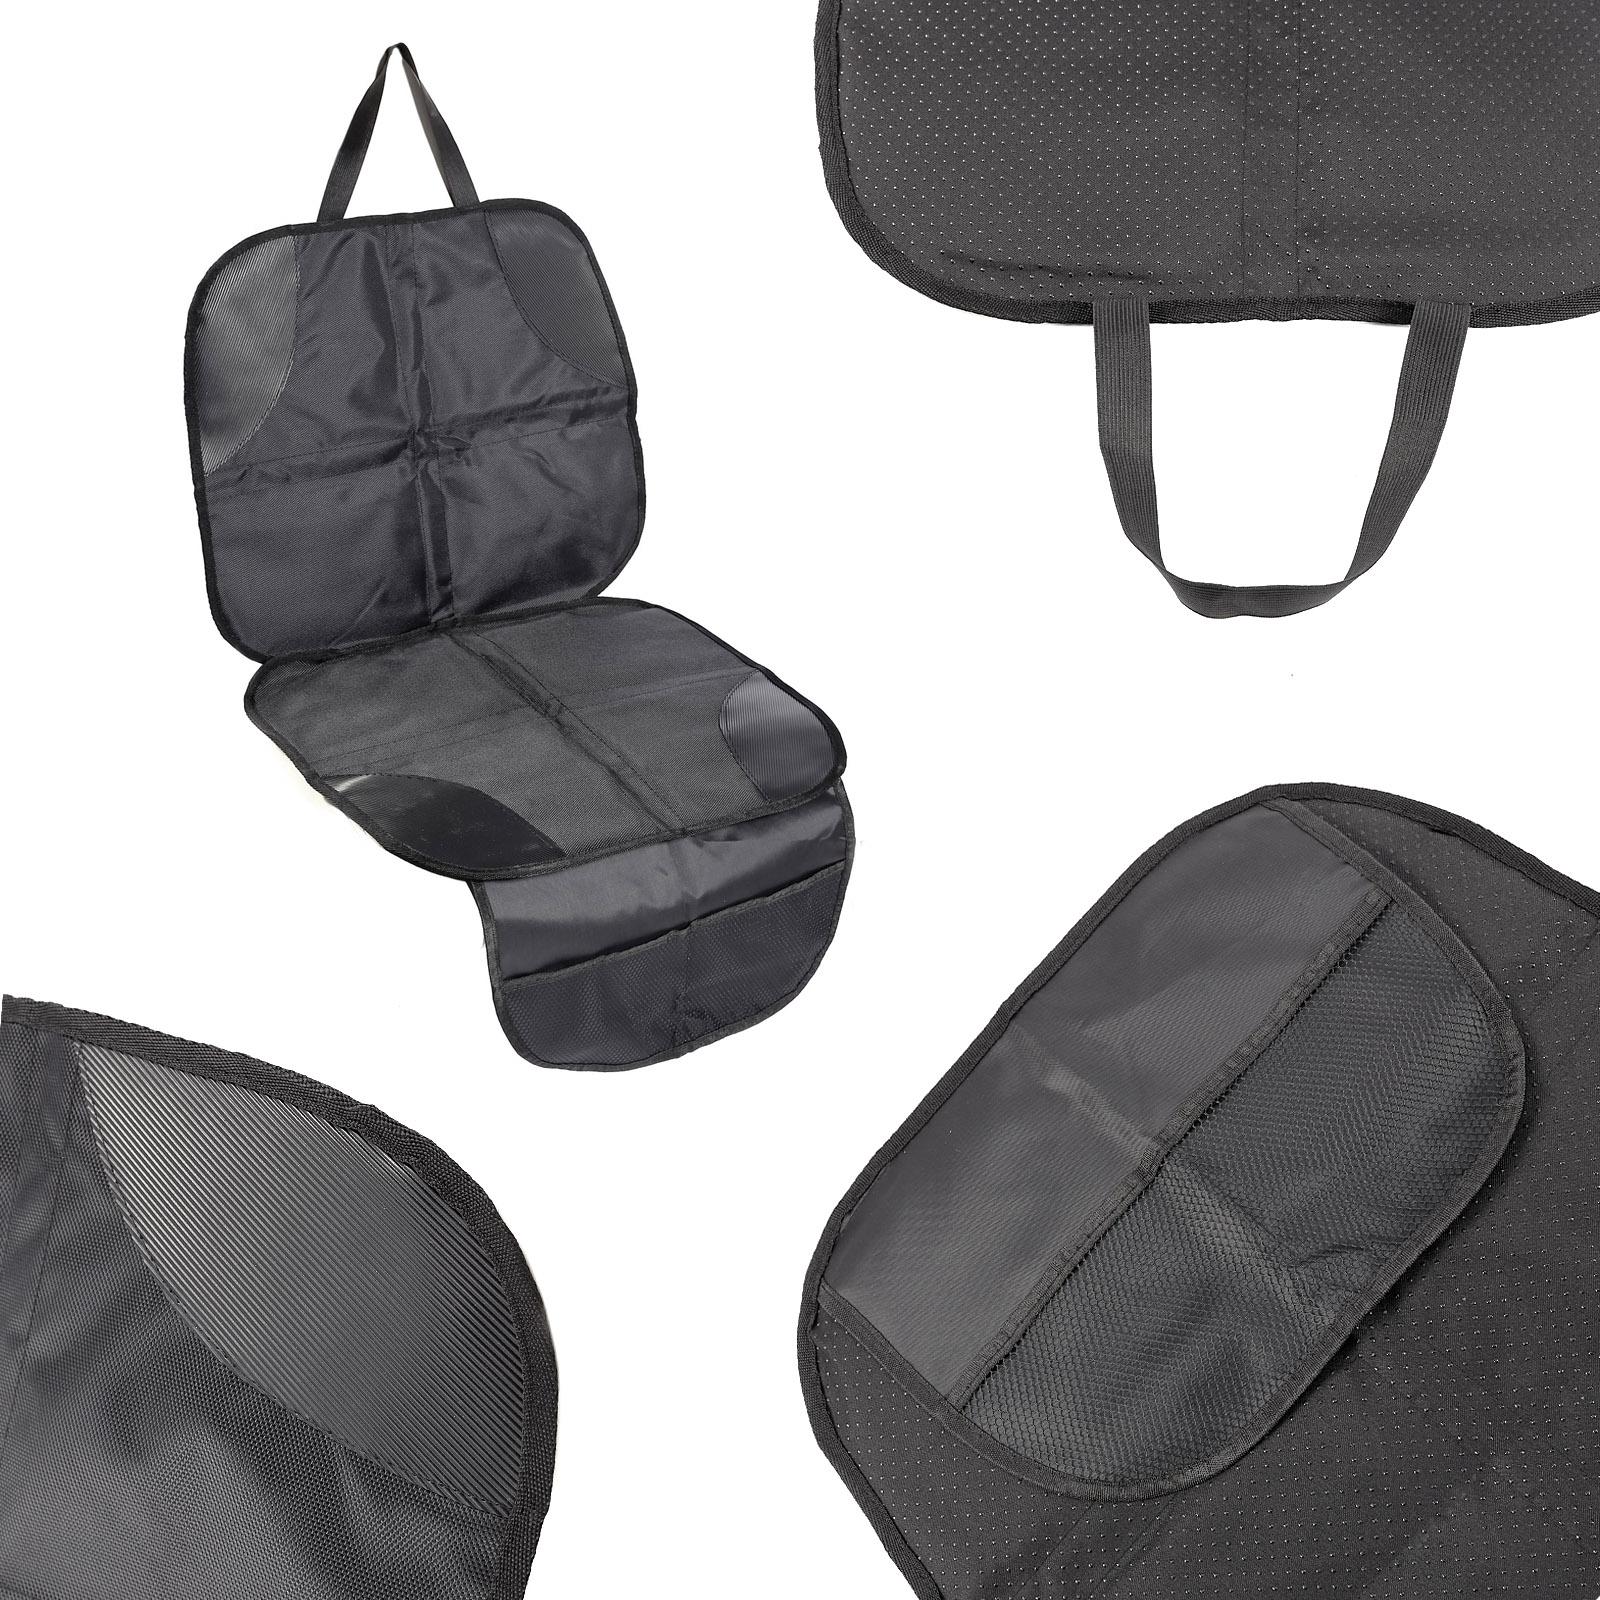 Protector para asiento de coche para ni os beb cubierta for Asientos infantiles coche